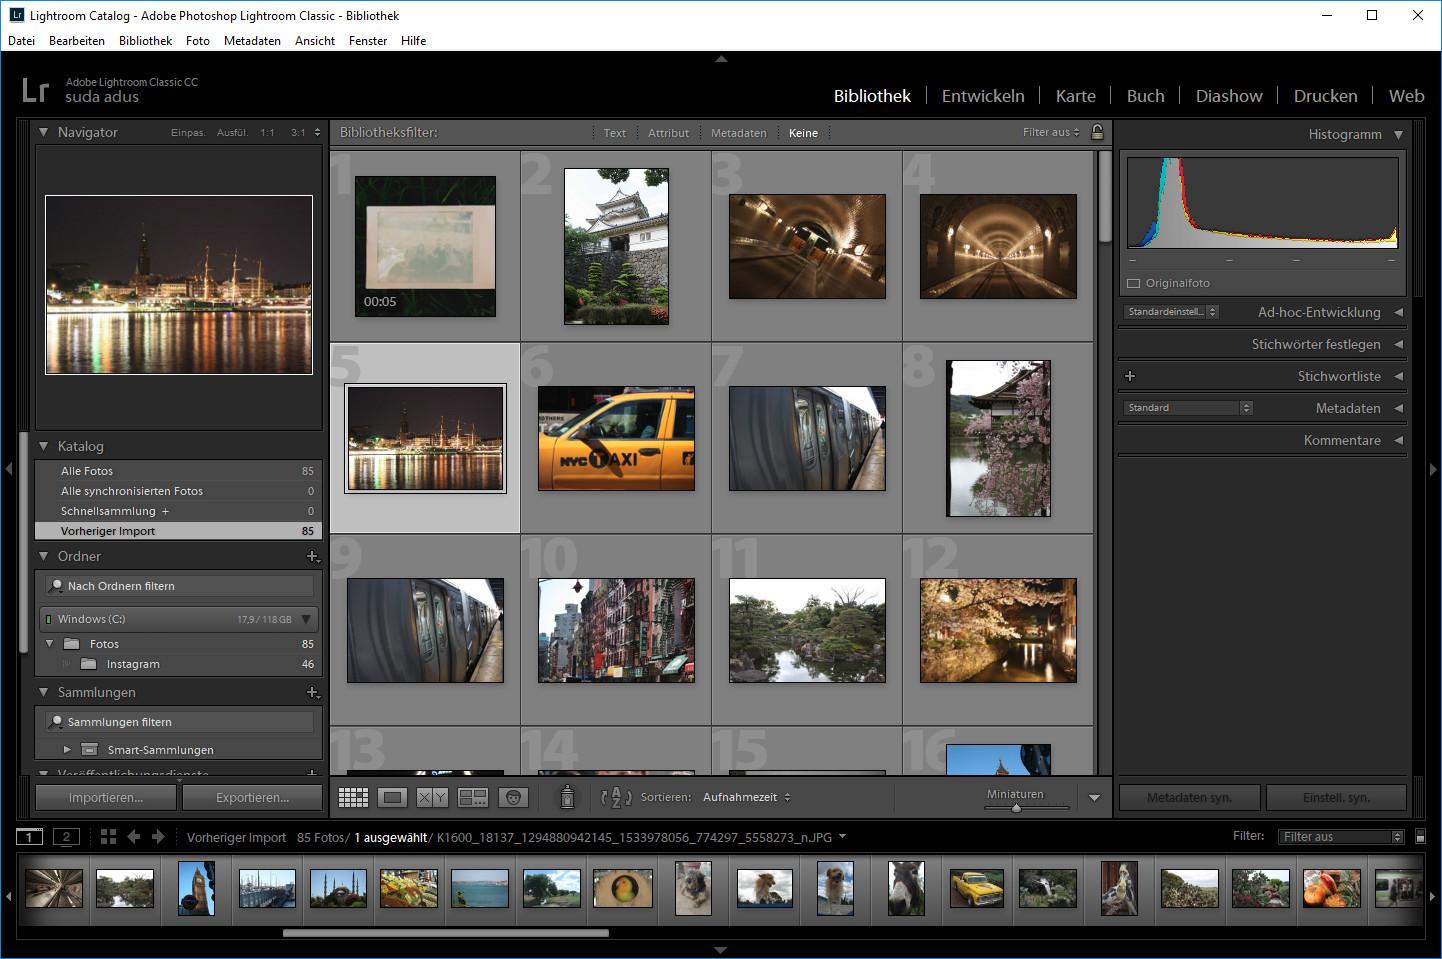 Screenshot 1 - Adobe Photoshop Lightroom Classic CC